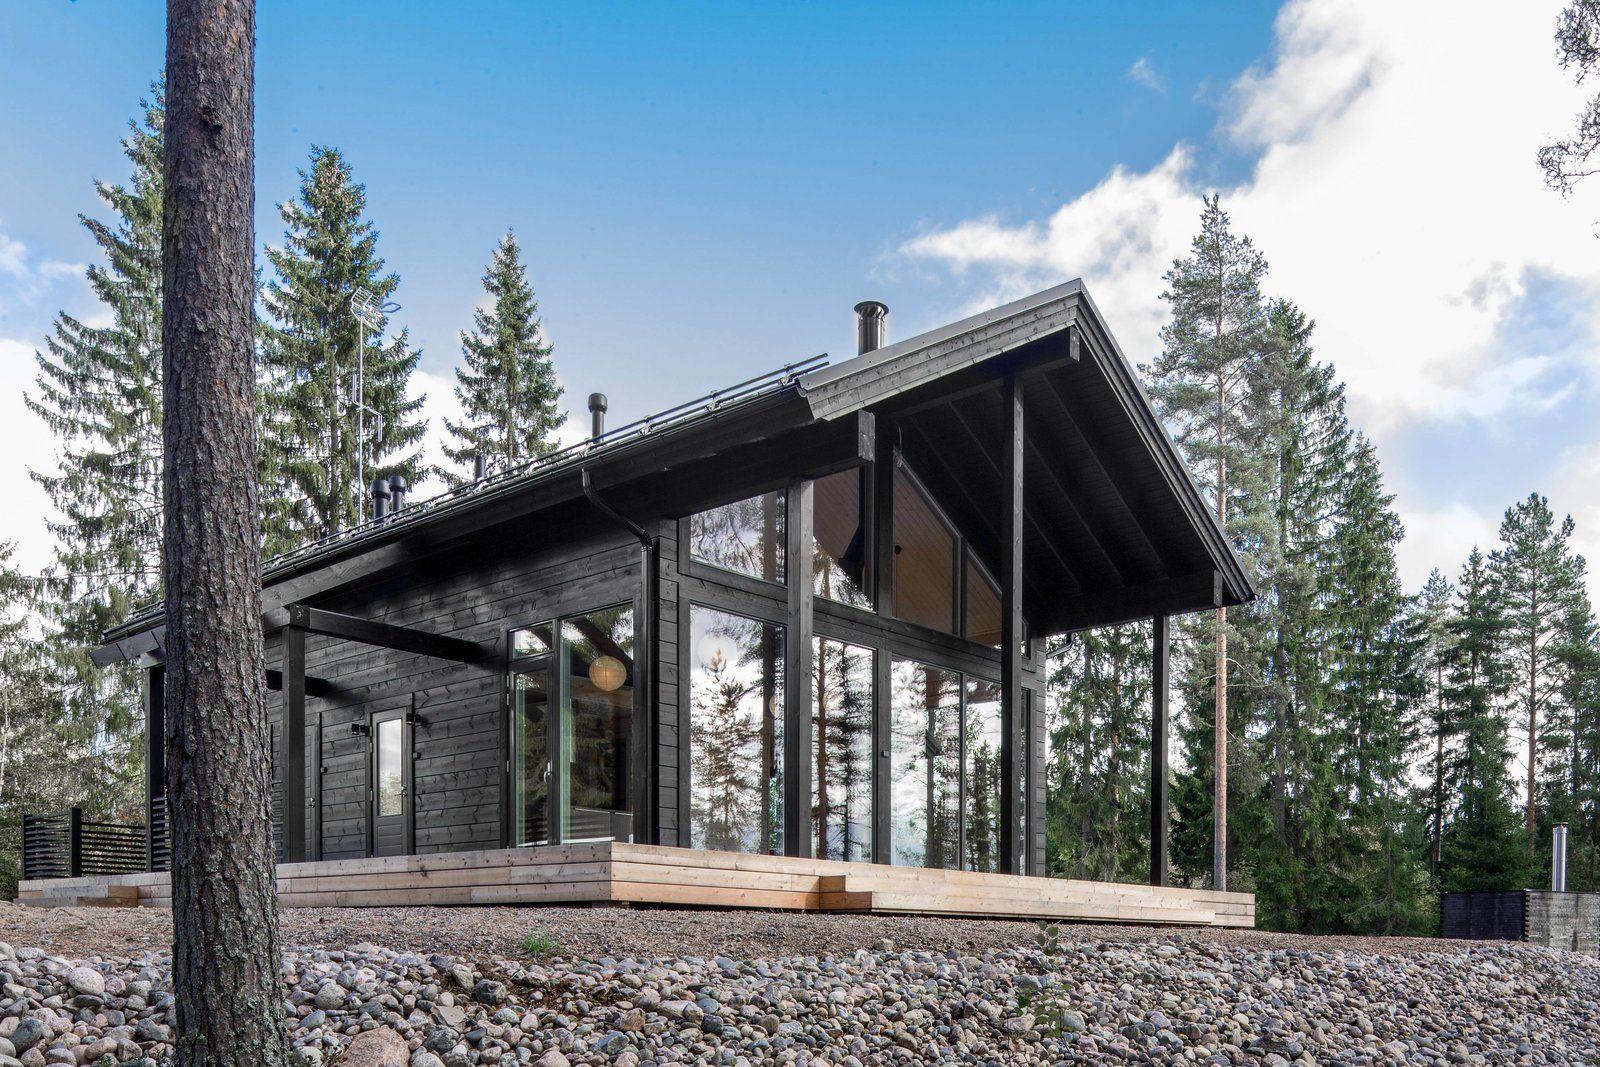 Log Cabin Kit Homes From Finland Cabin Kit Homes Modern Log Cabins Cabin Design